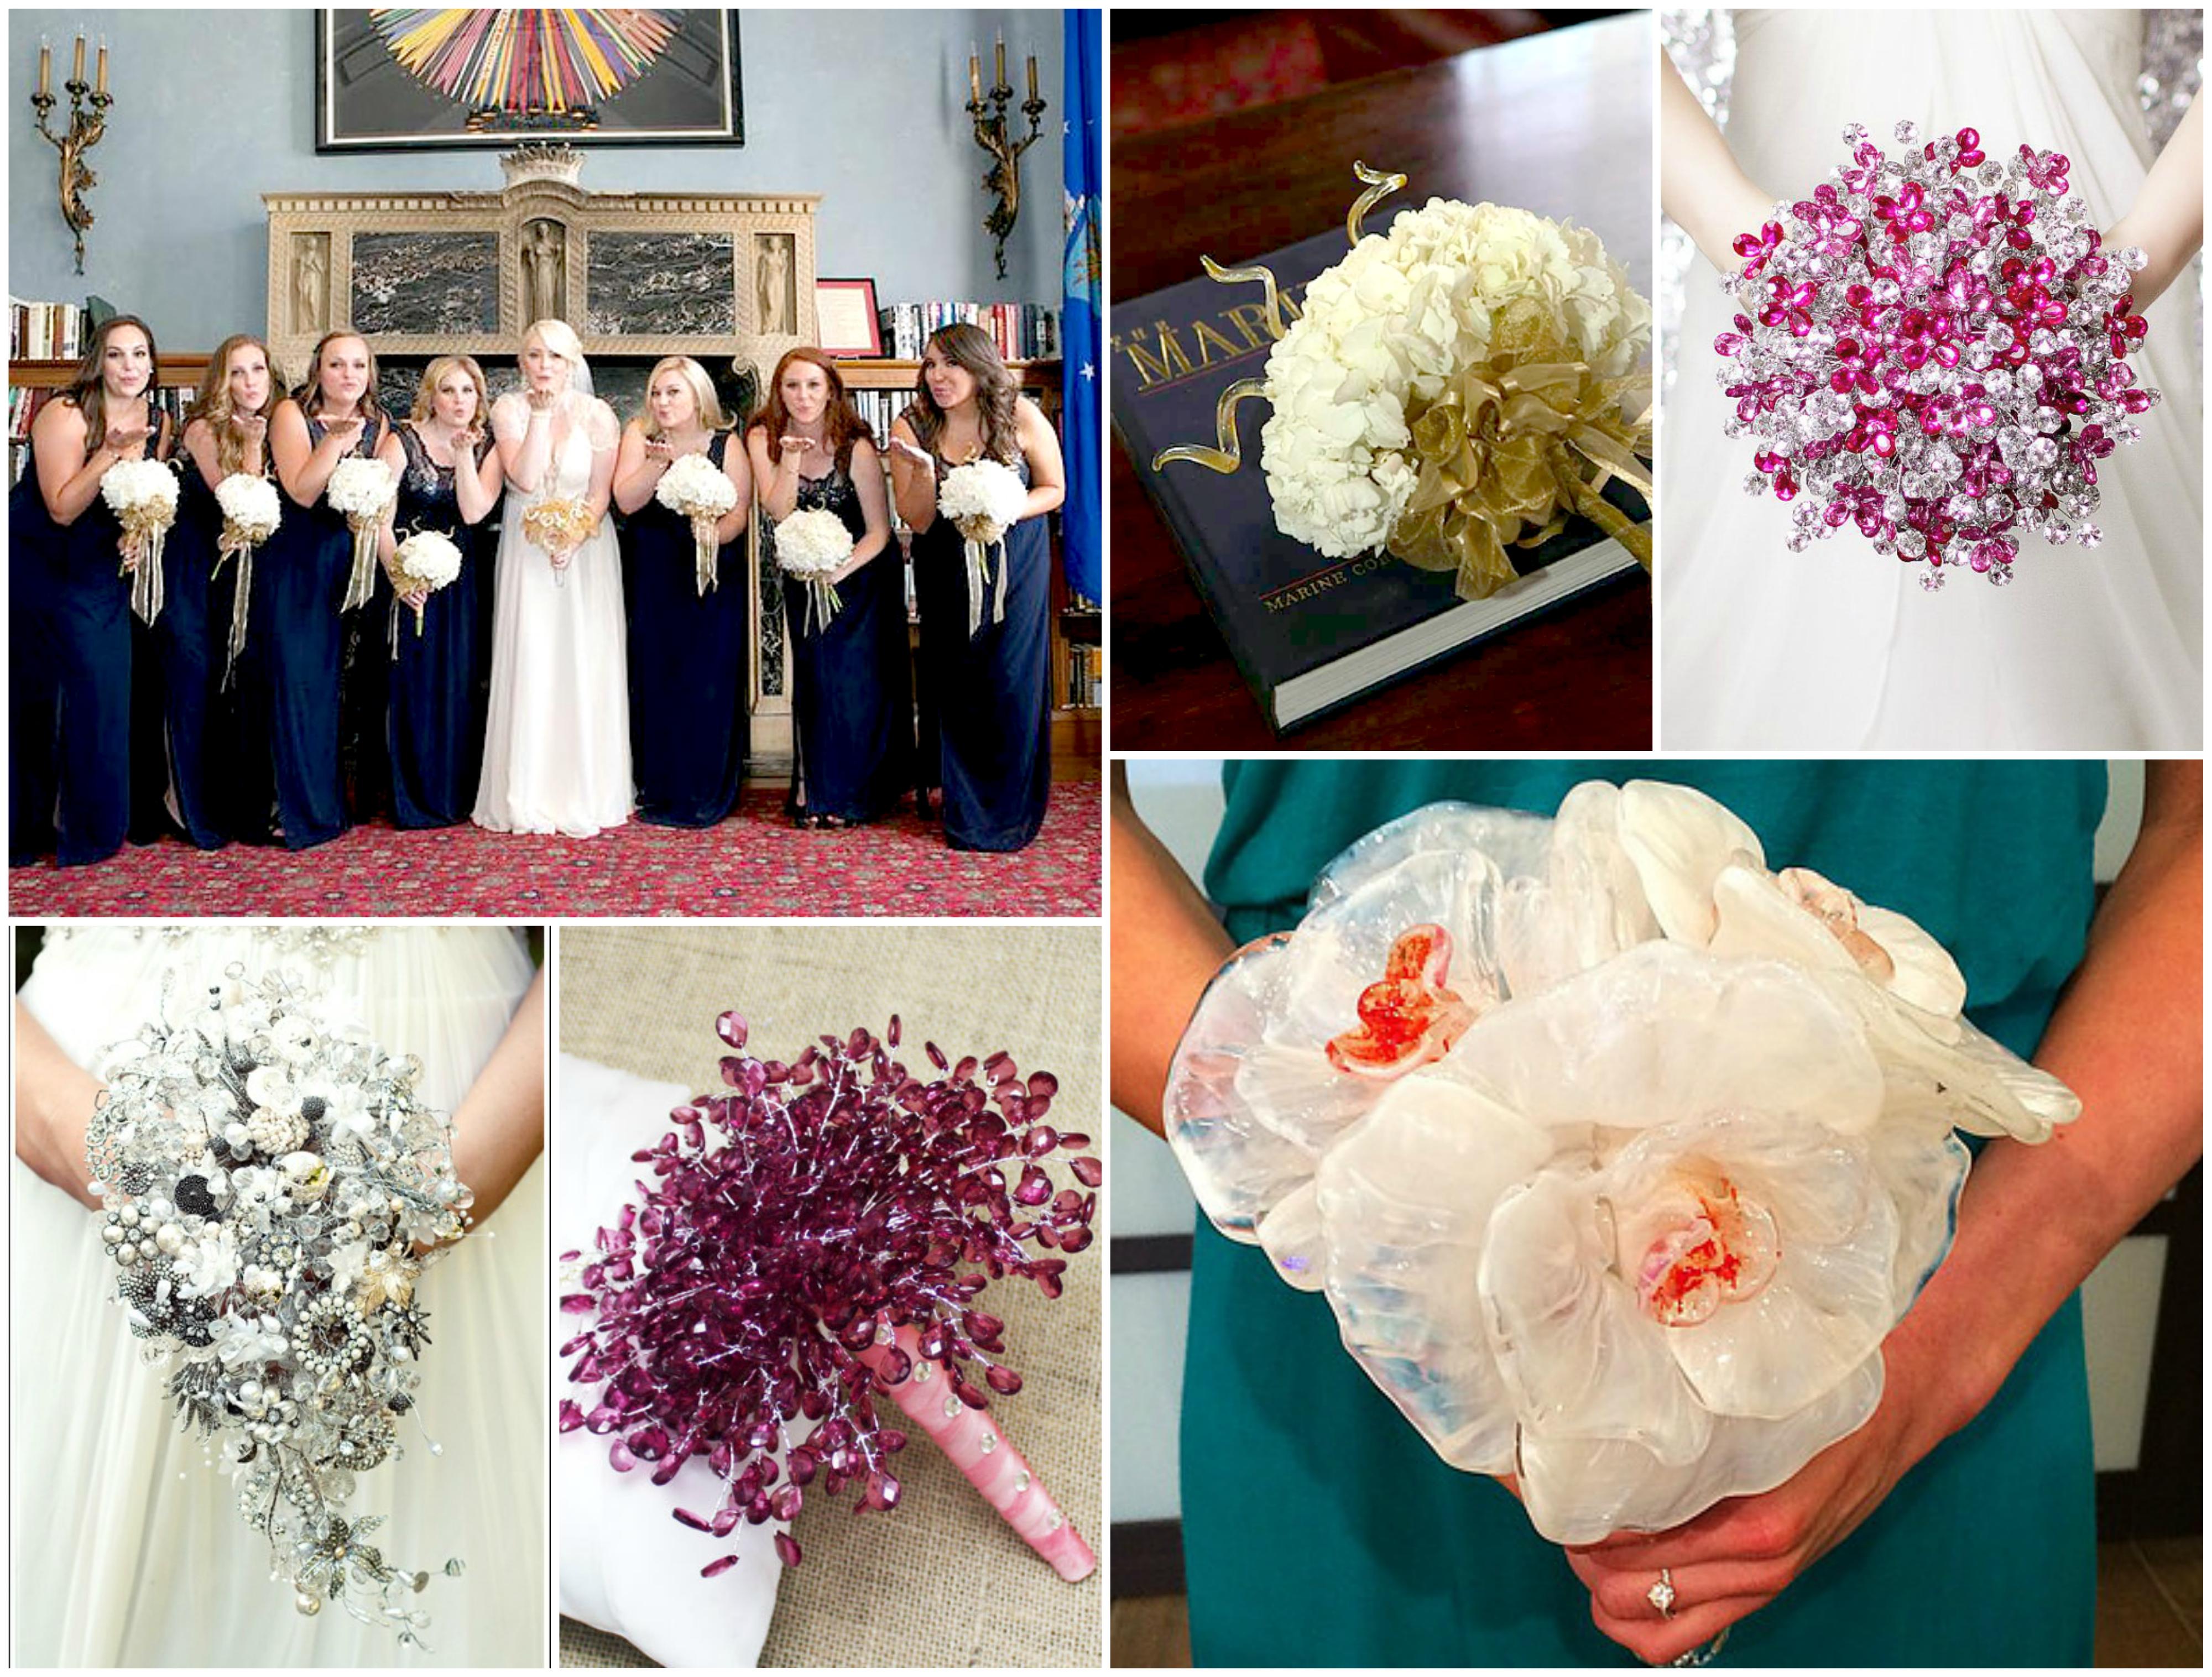 Bridal glass bouquets